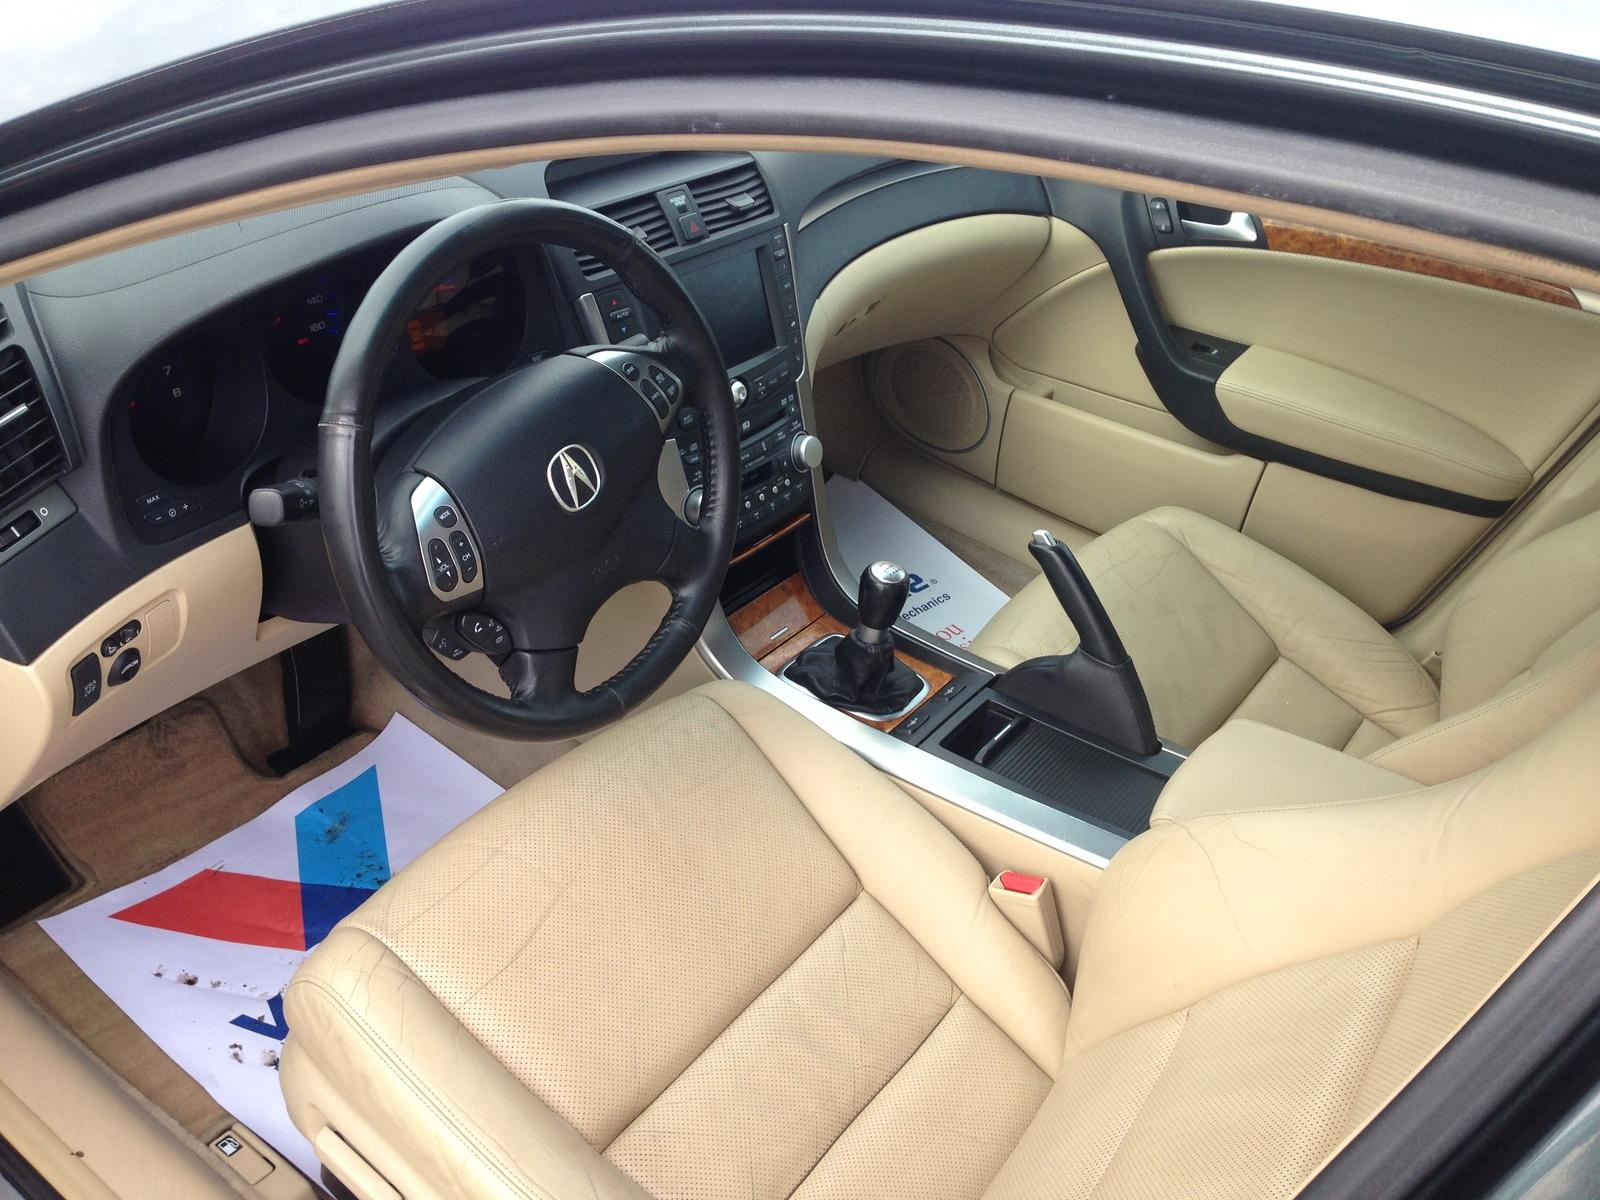 1999 Honda Accord Interior